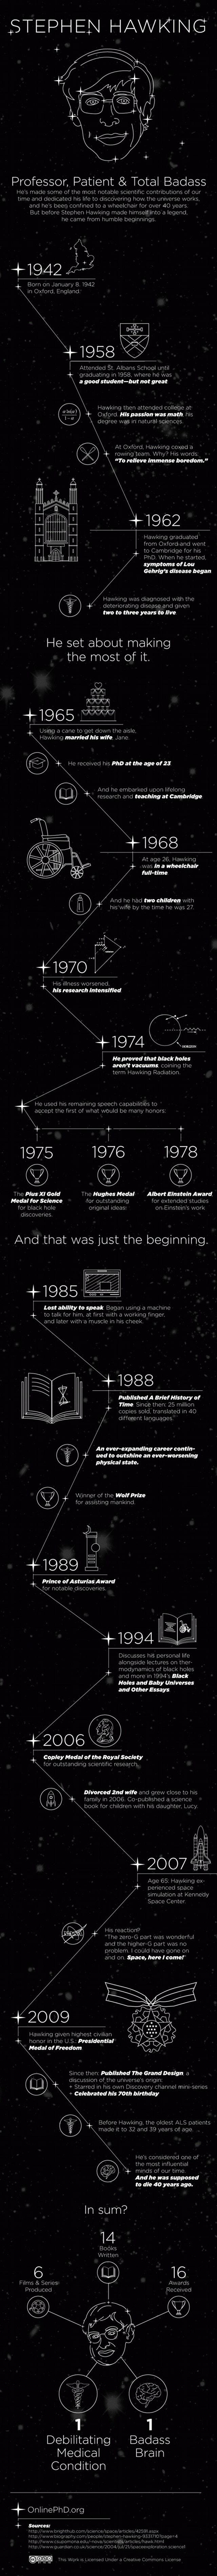 hawking-infographic-full